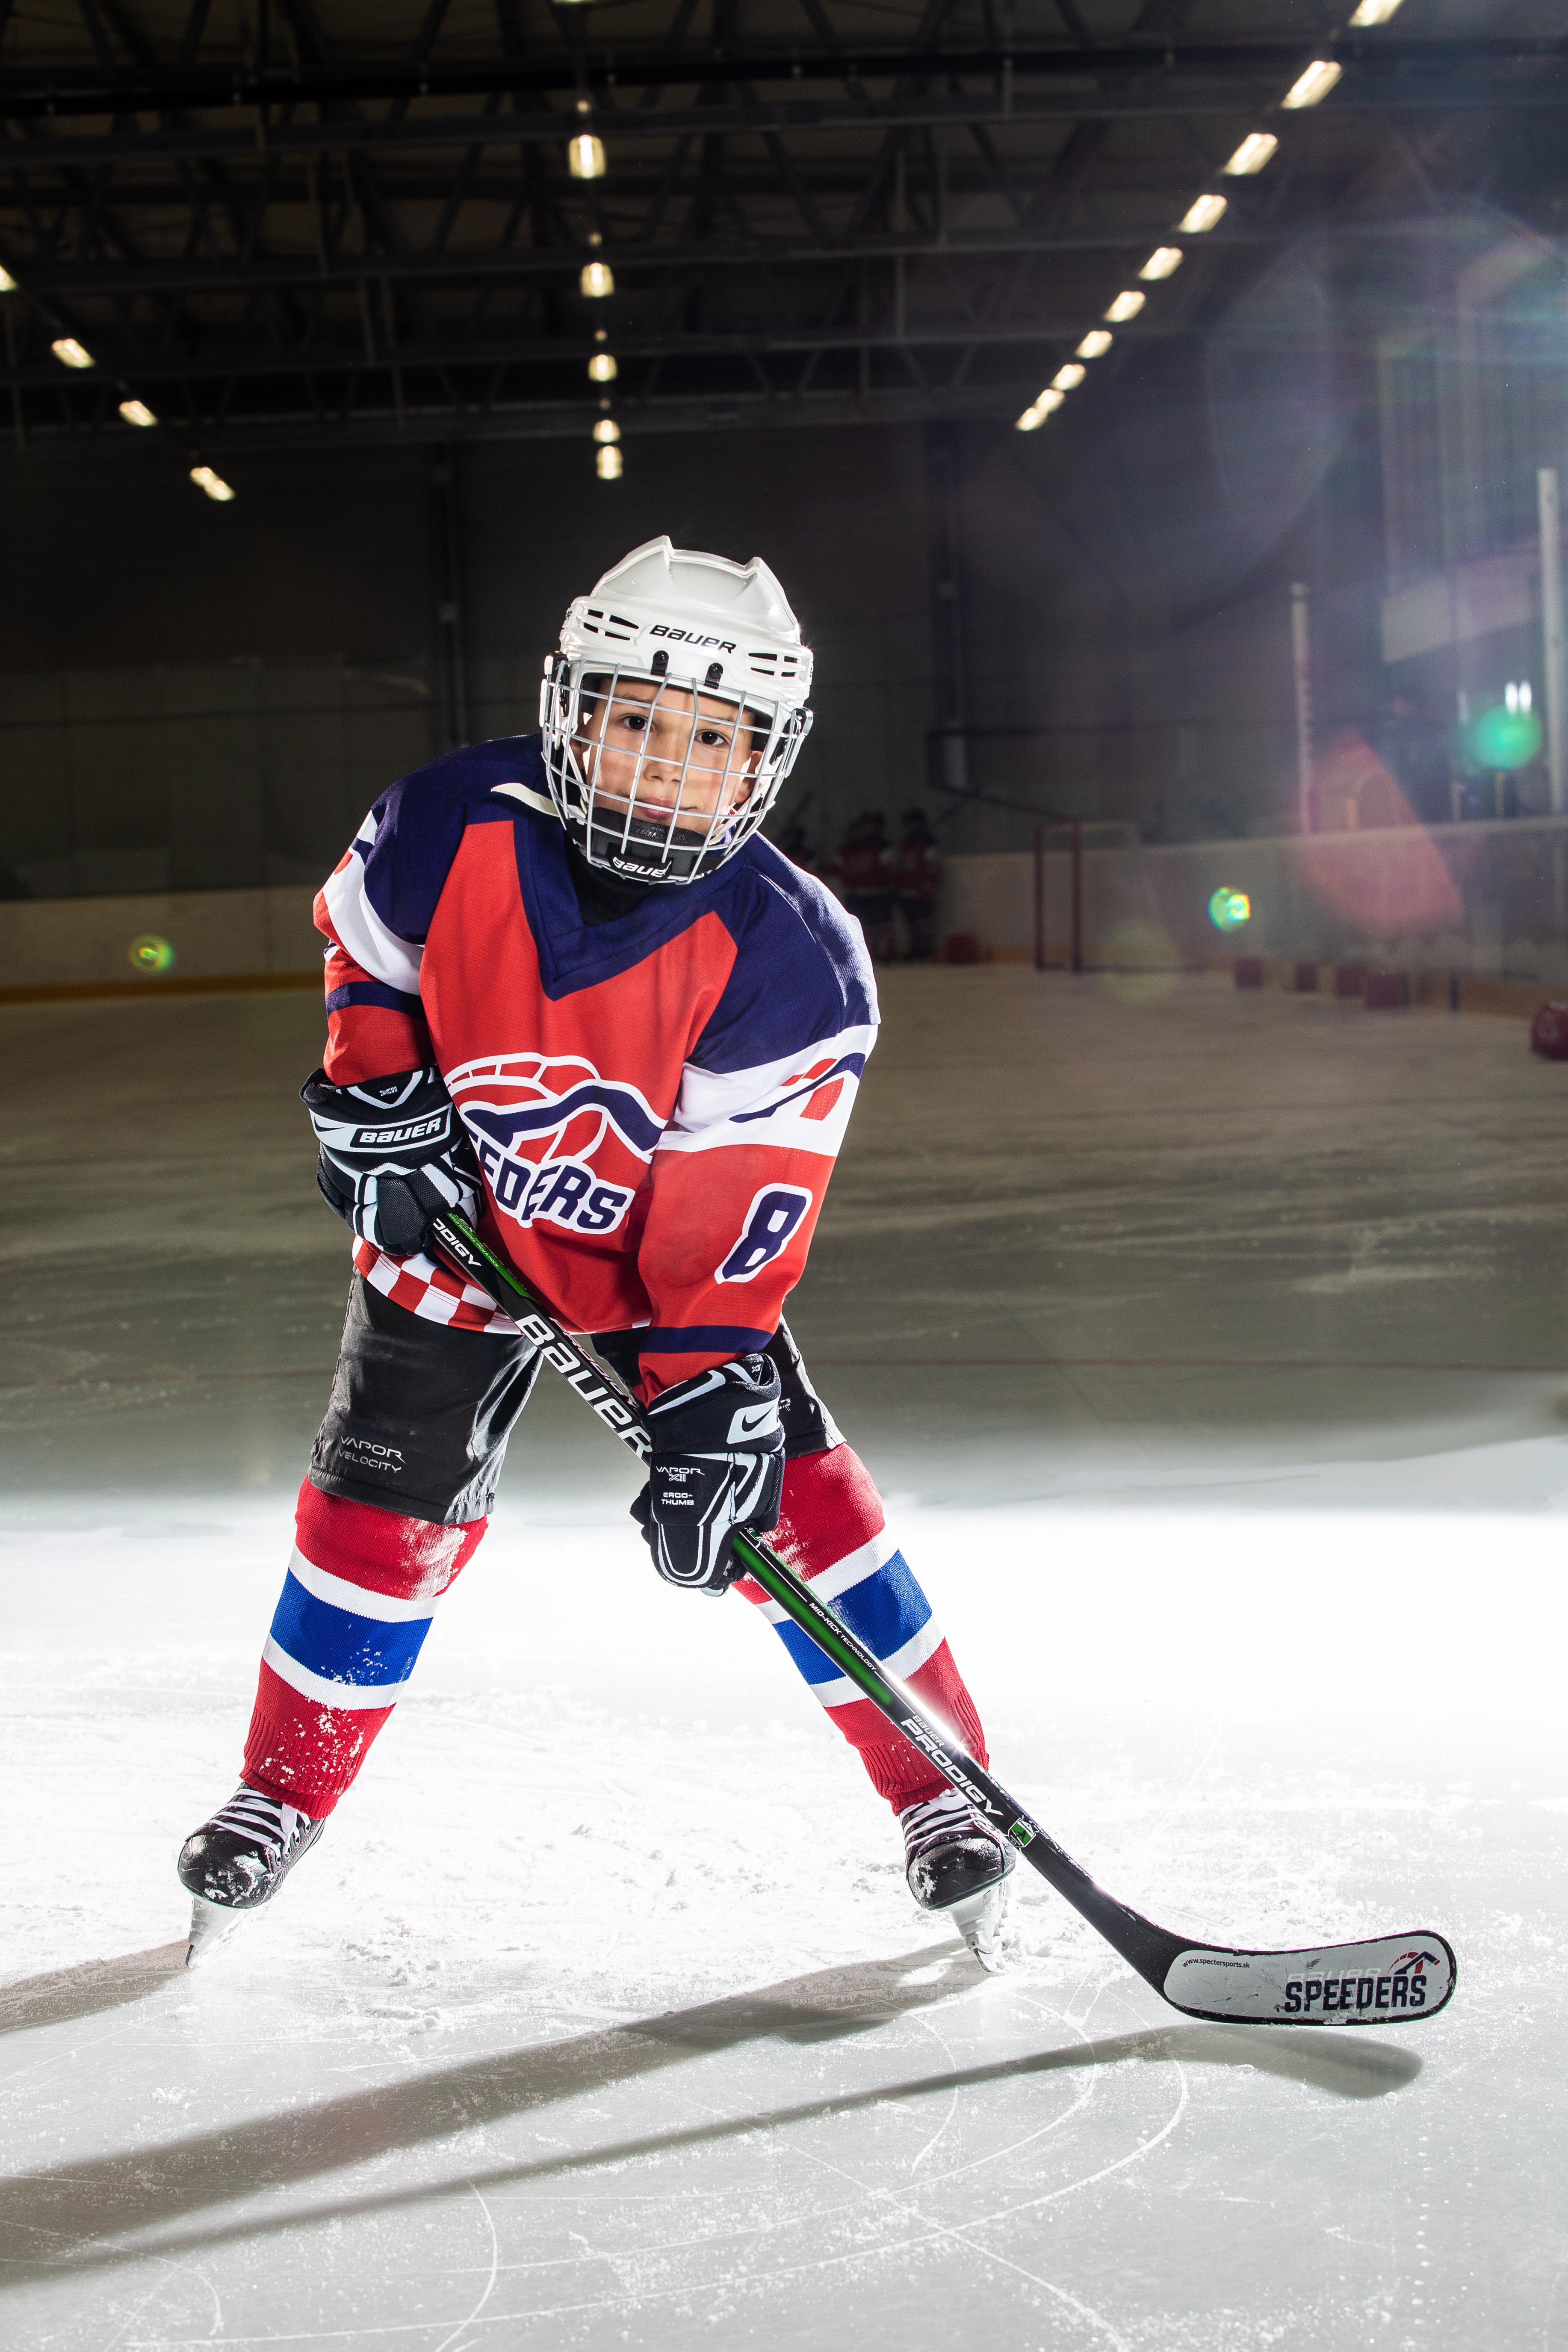 Alexander Snajder Speeders Bratislava cislo 8 hokej